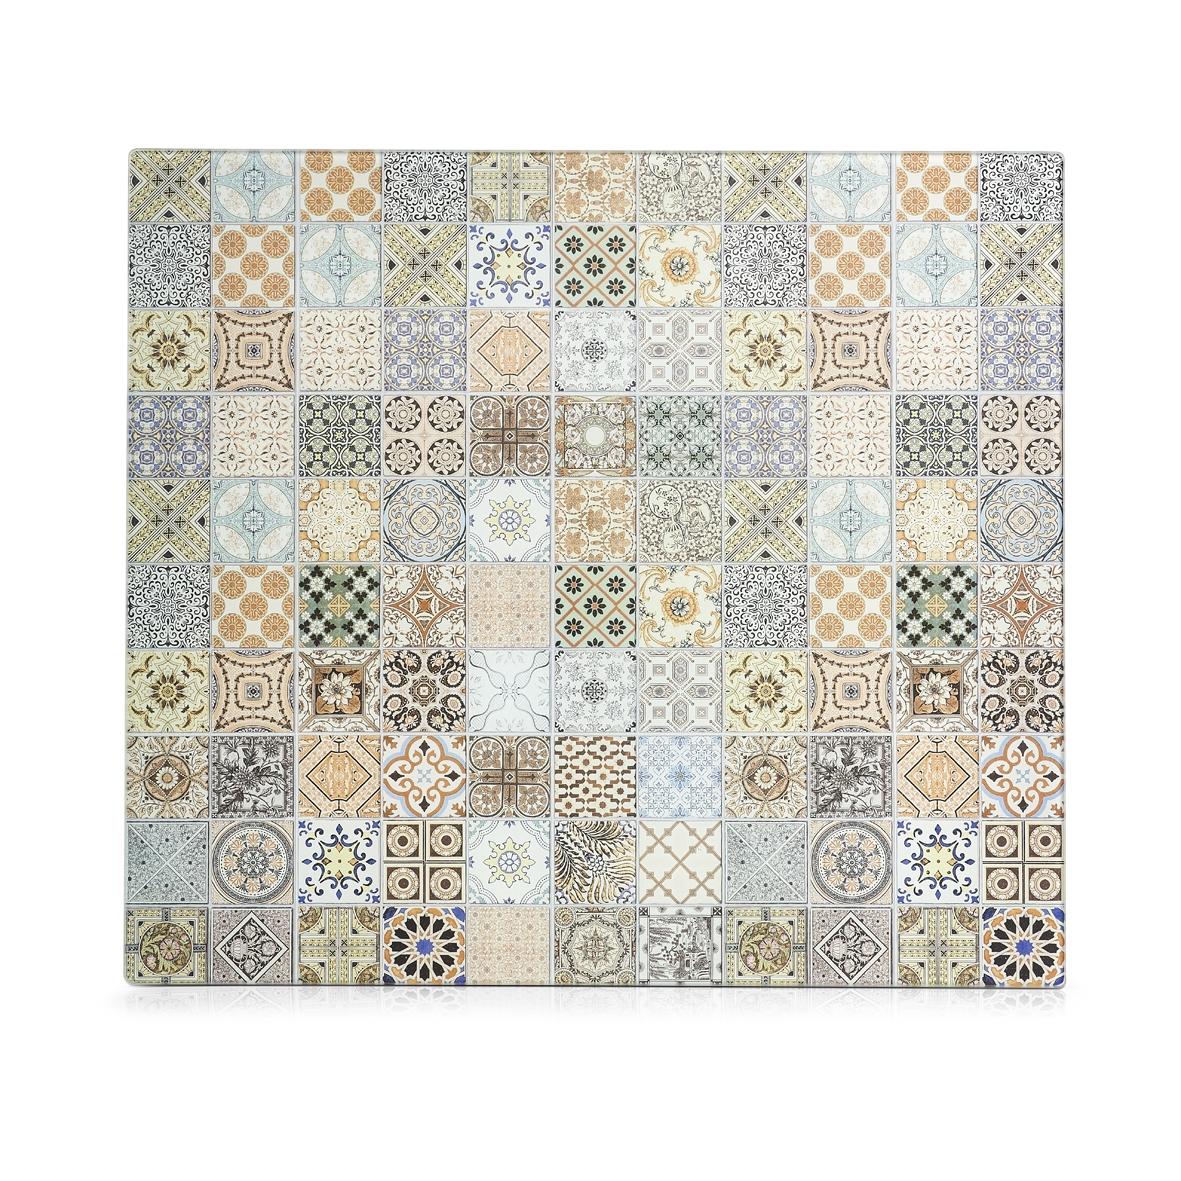 Placa din sticla protectie perete/plita, Mosaic Multicolor, L56xl50 cm